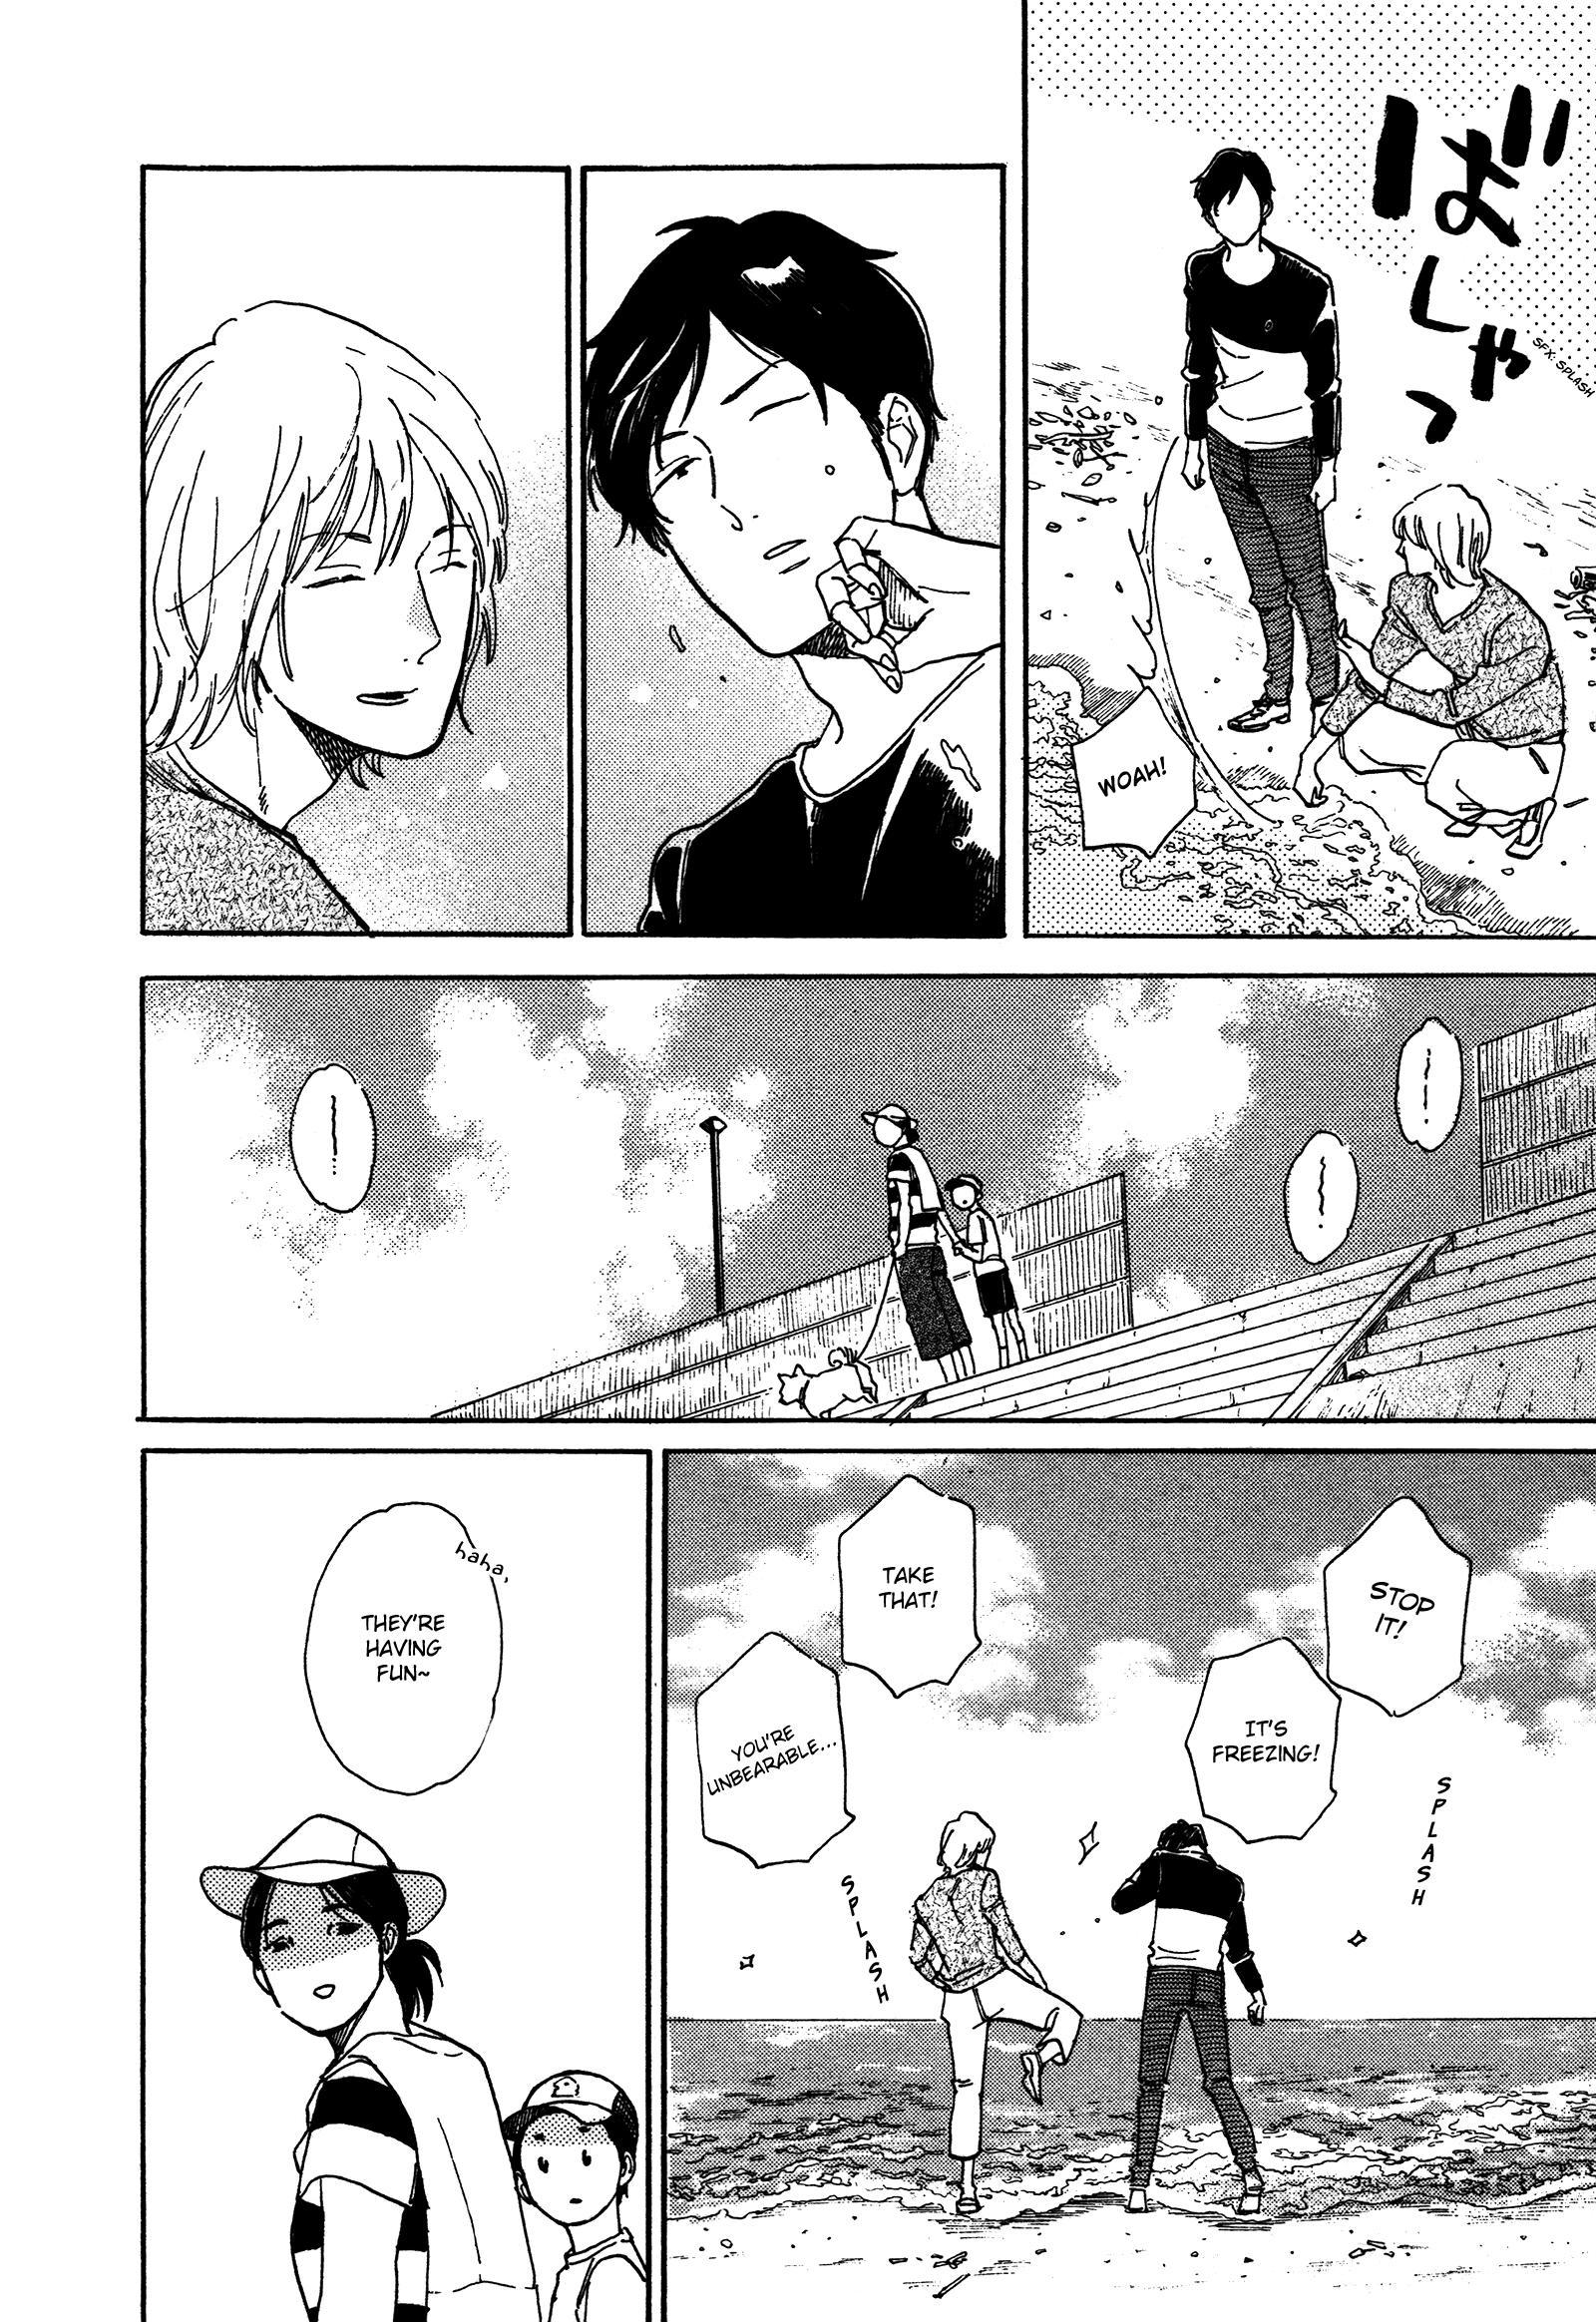 Stay Gold (Hideyoshico) Vol.4 Chapter 18 page 12 - Mangakakalots.com